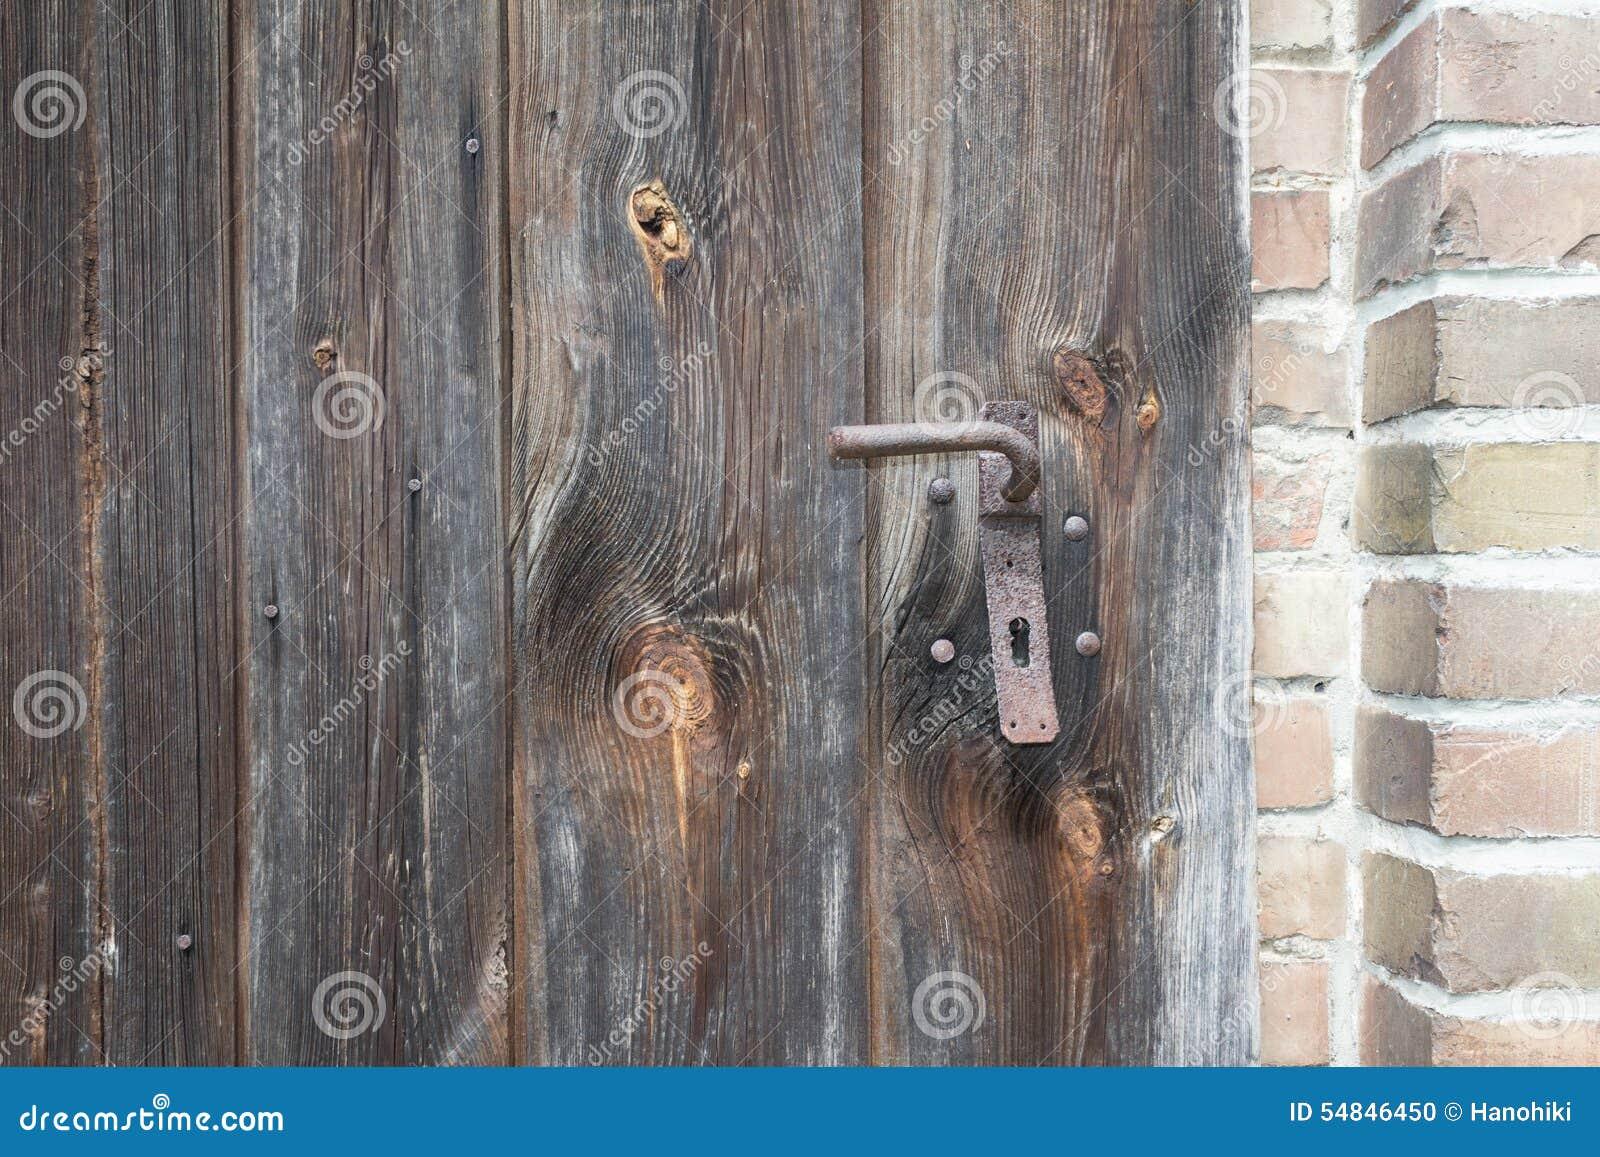 Puerta de madera vieja fondo de madera de la textura for Puerta vieja madera